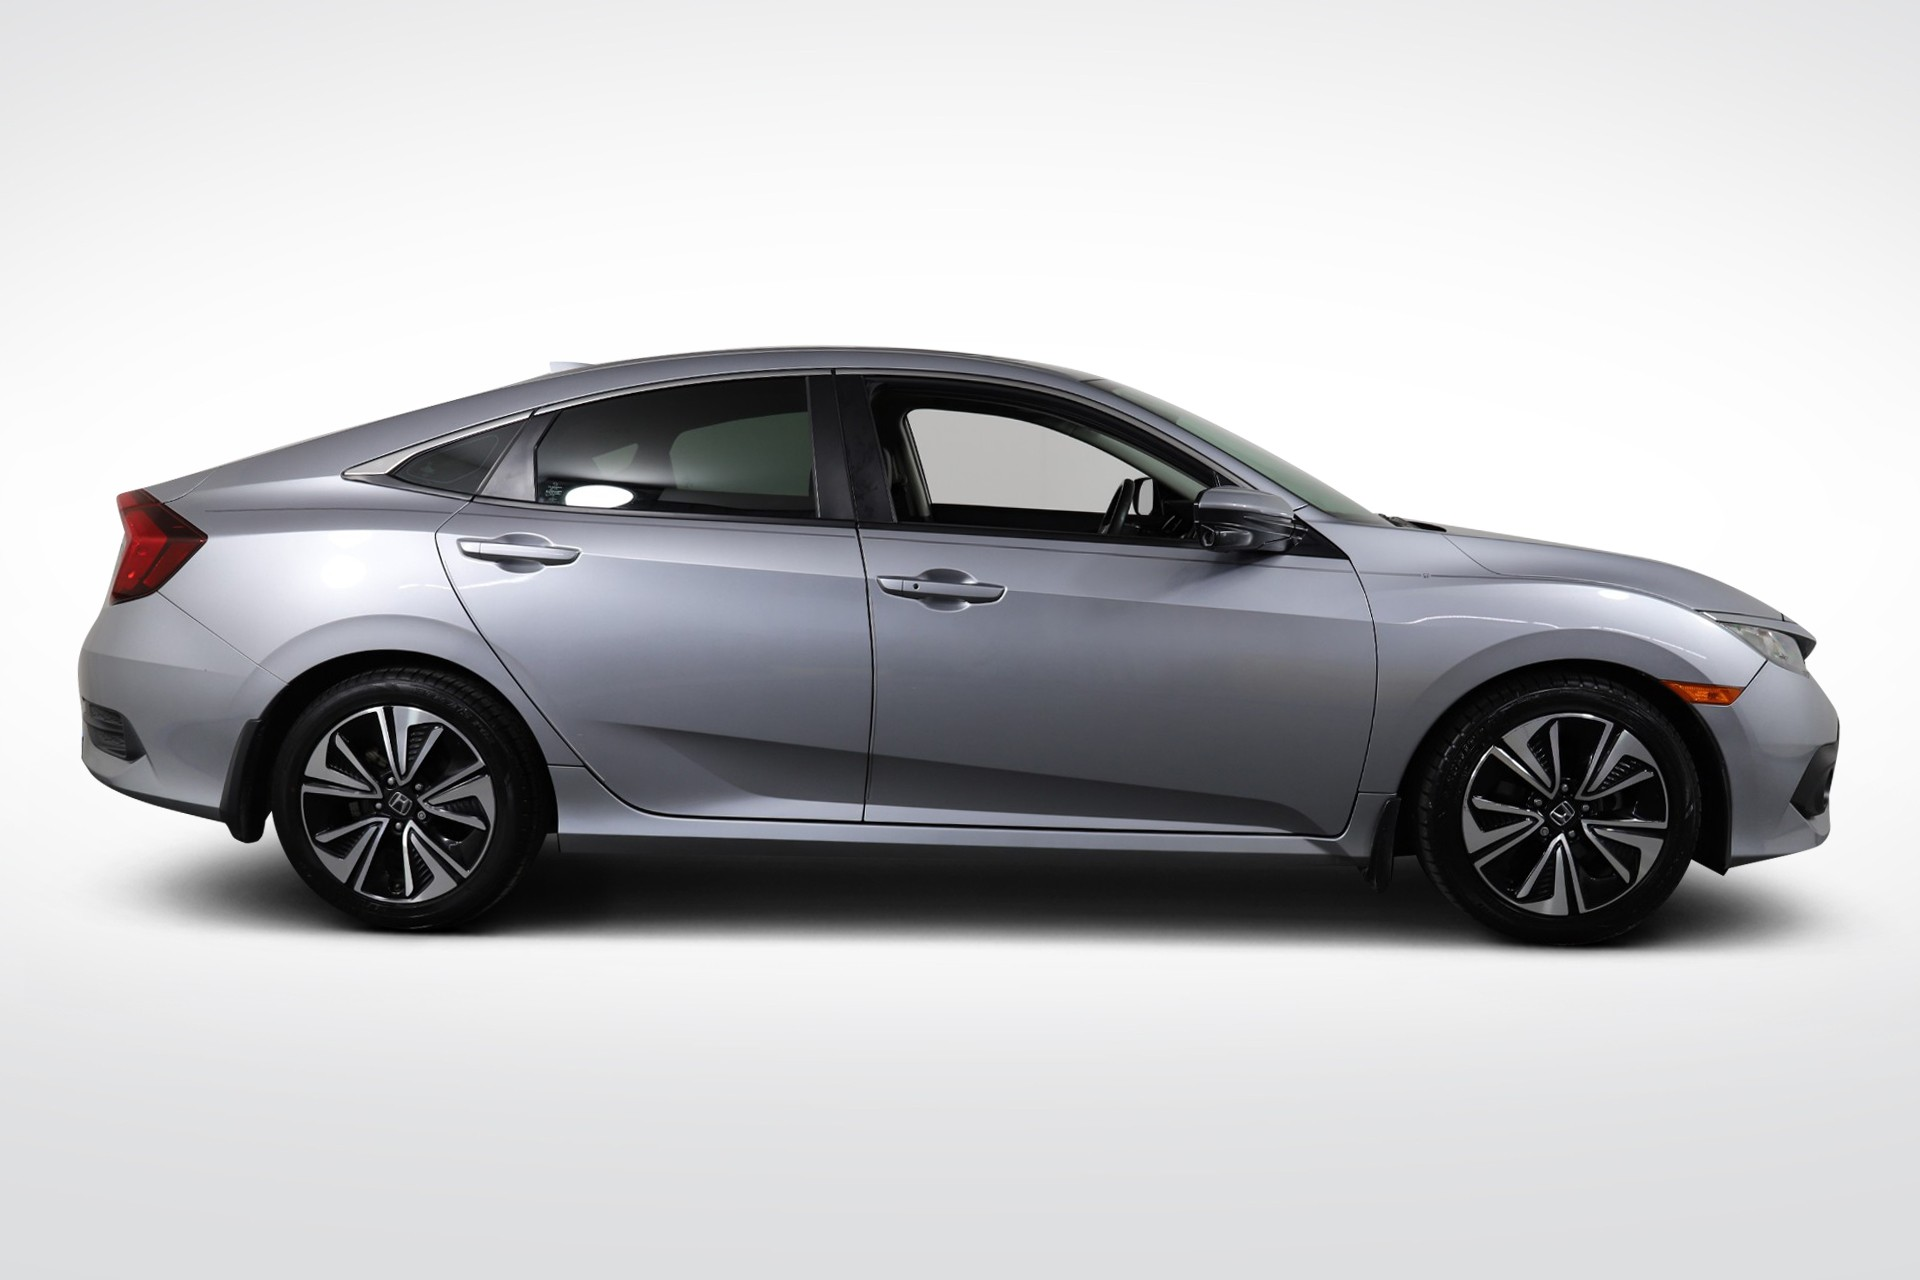 Honda Civic EX-L (from $18,350)